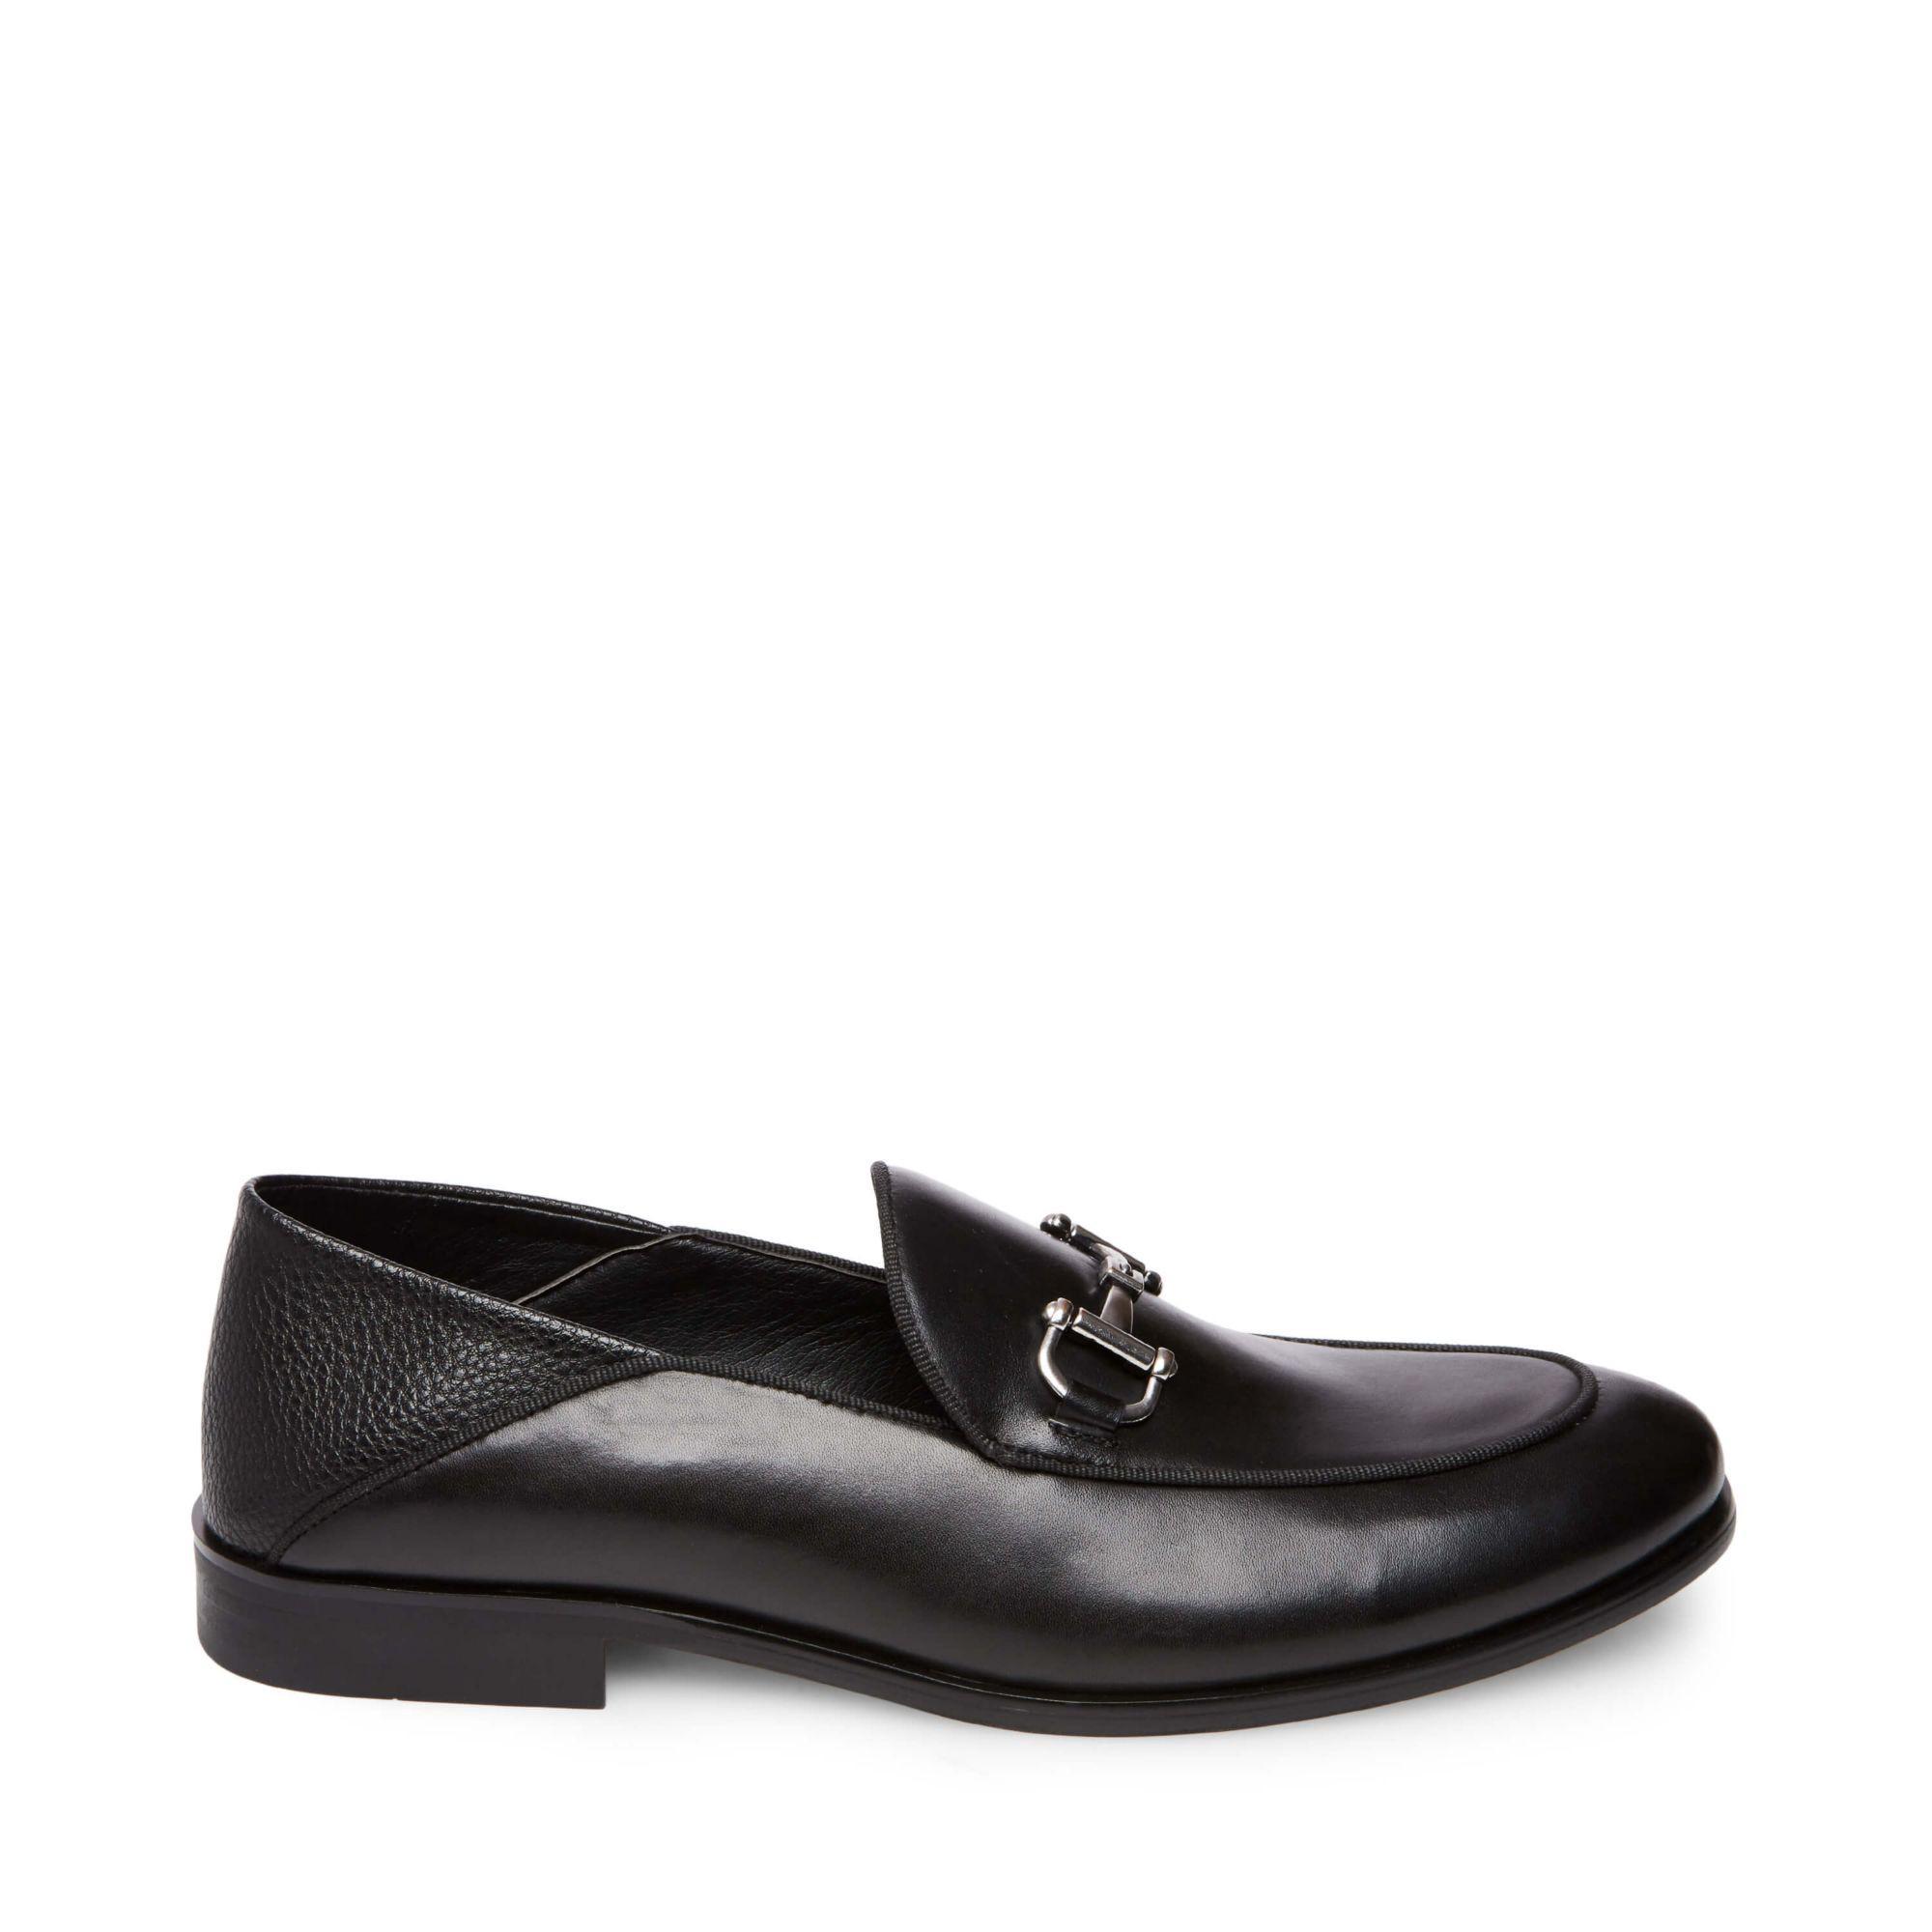 Steve Madden Men's Sauce Bit Loafers Men's Shoes In Black